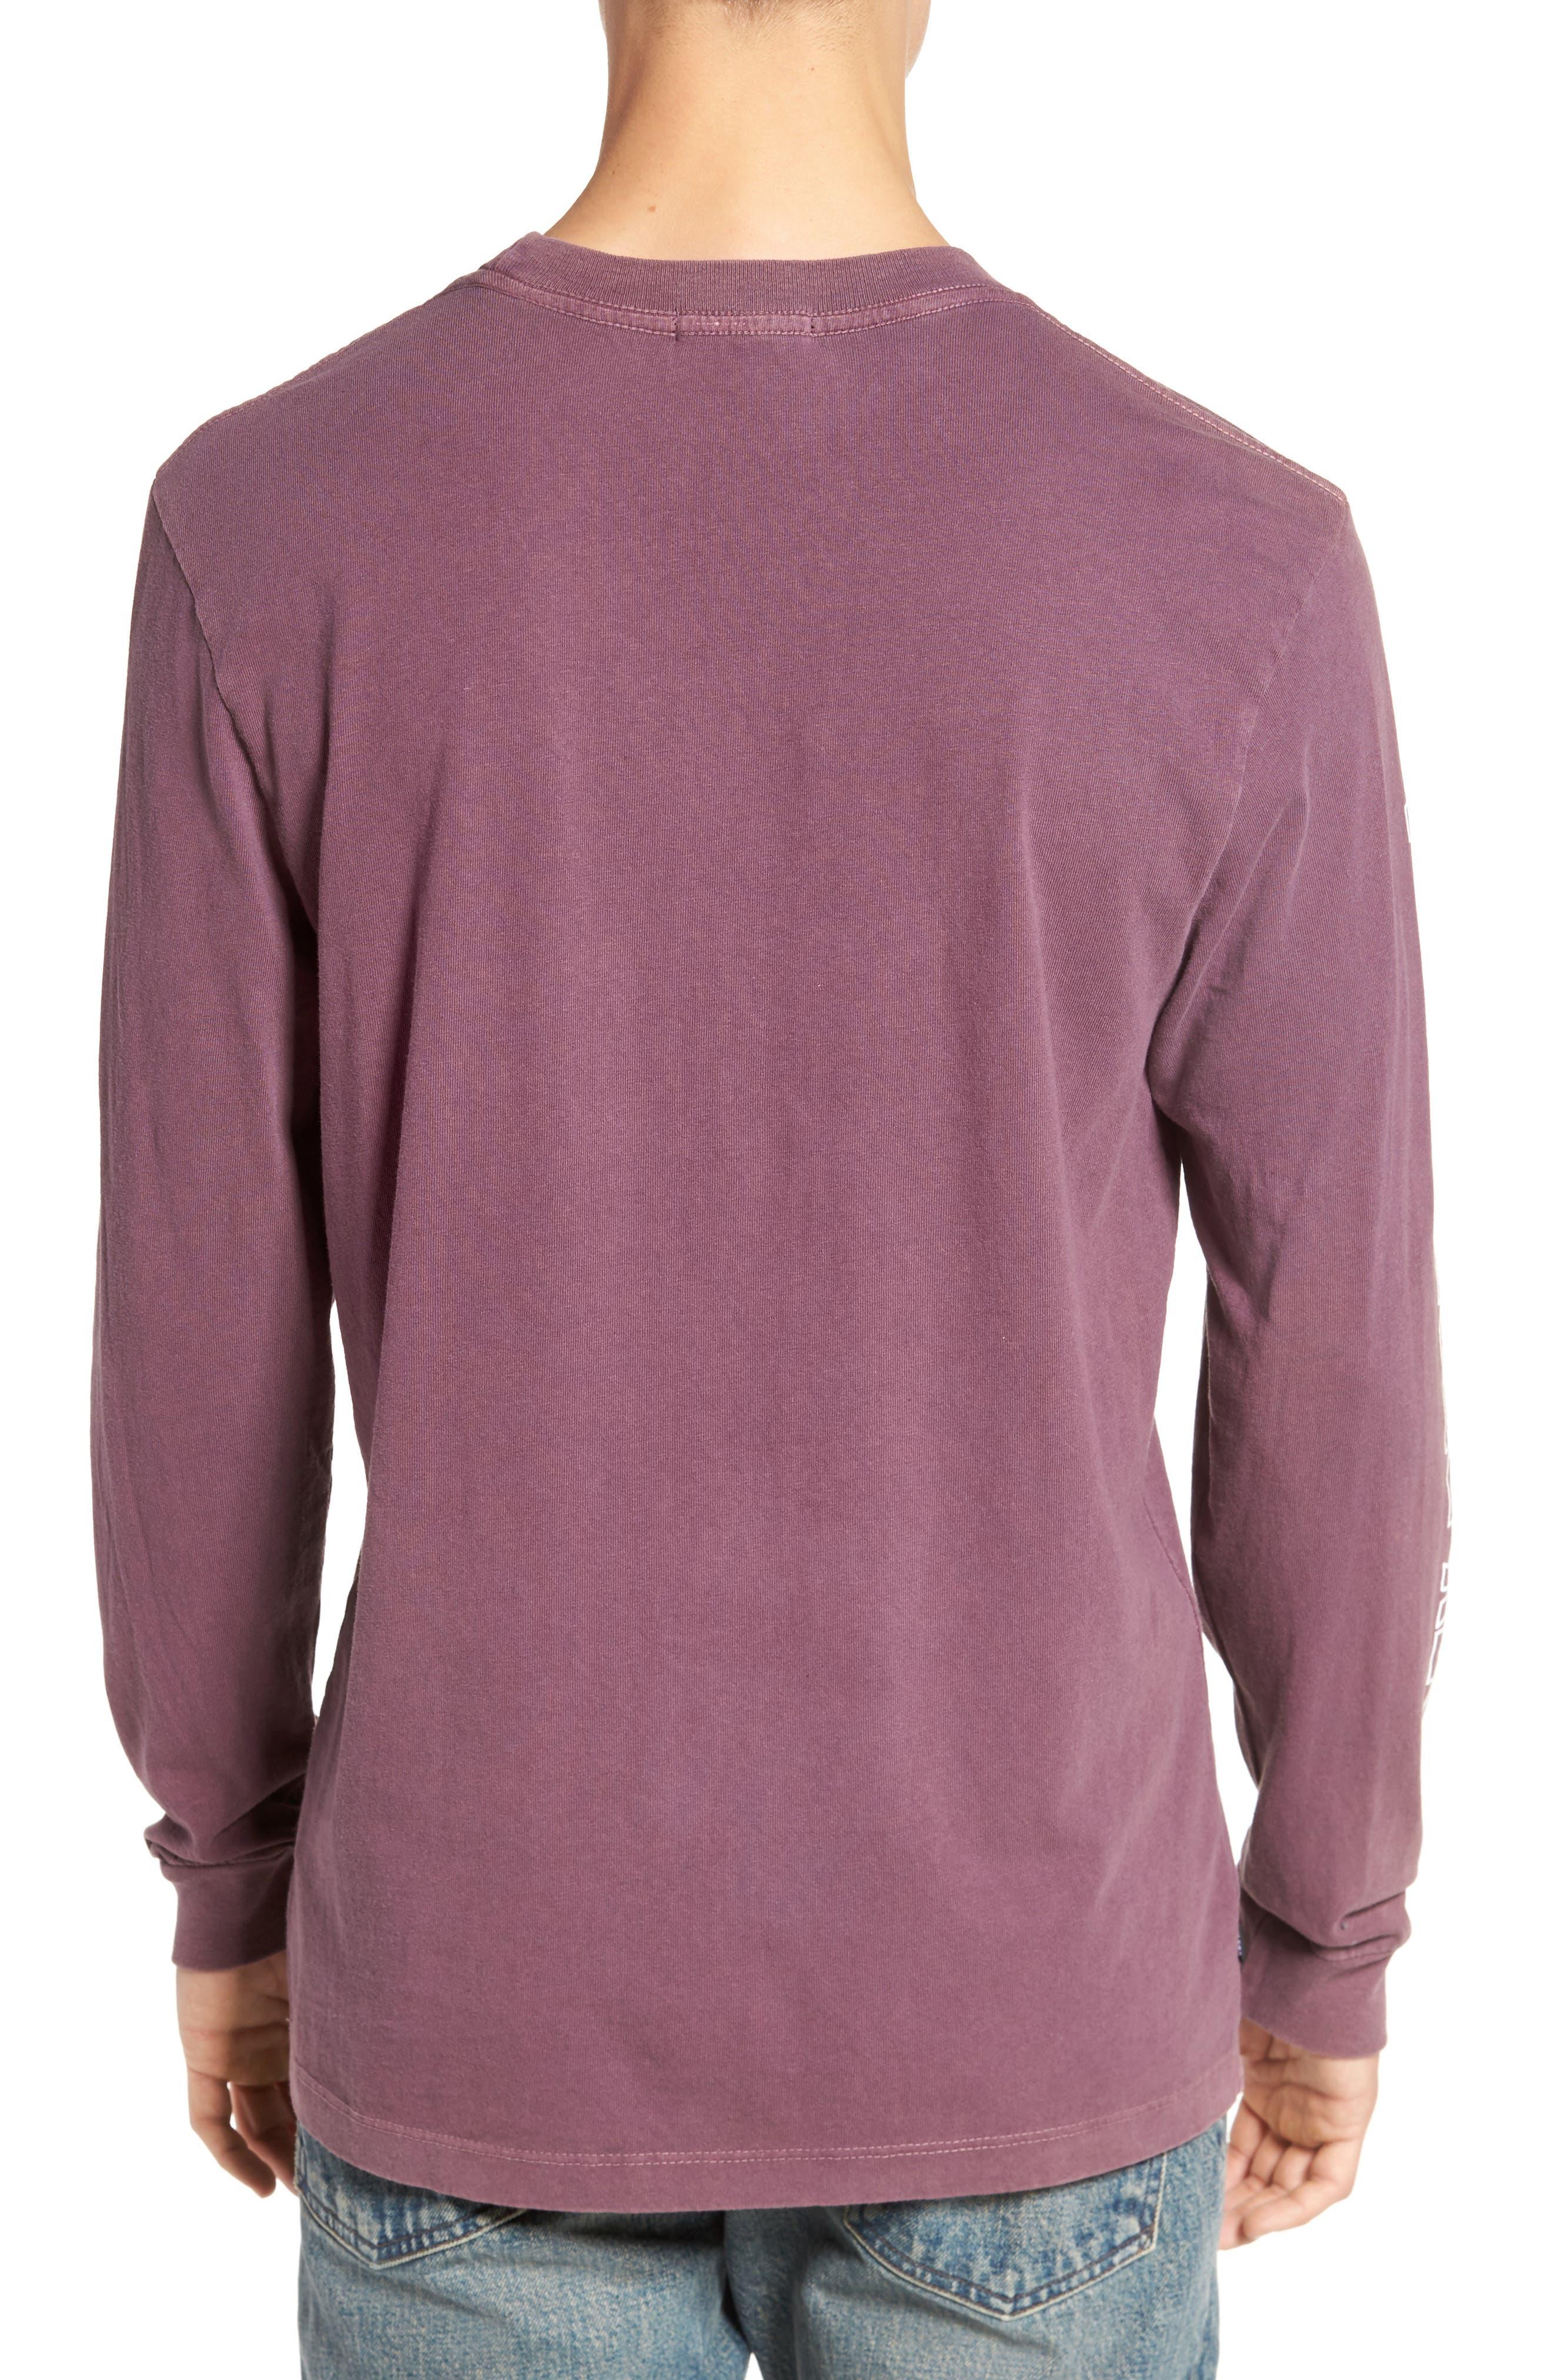 Rough Draft Long Sleeve T-Shirt,                             Alternate thumbnail 2, color,                             503